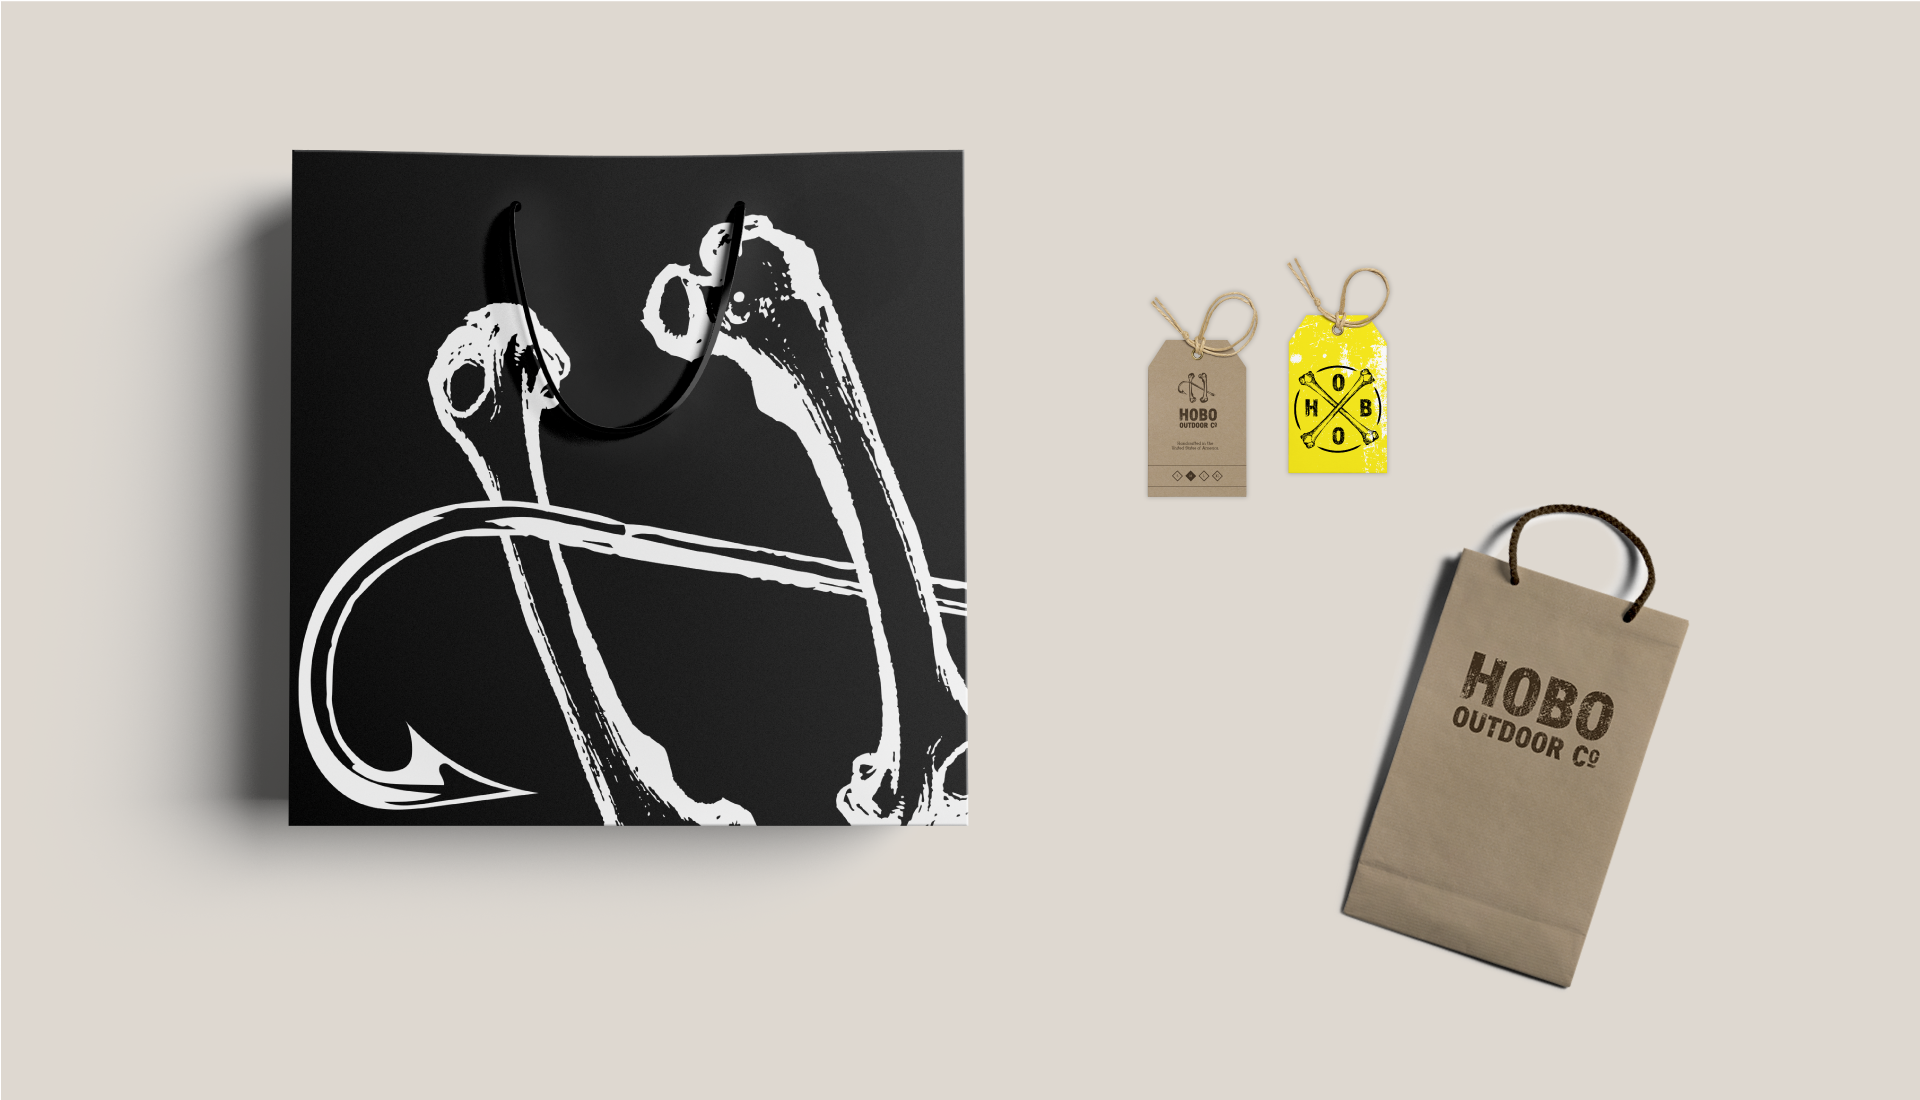 Hobo Outdoor Co.   Branding   The Underground Design Studio